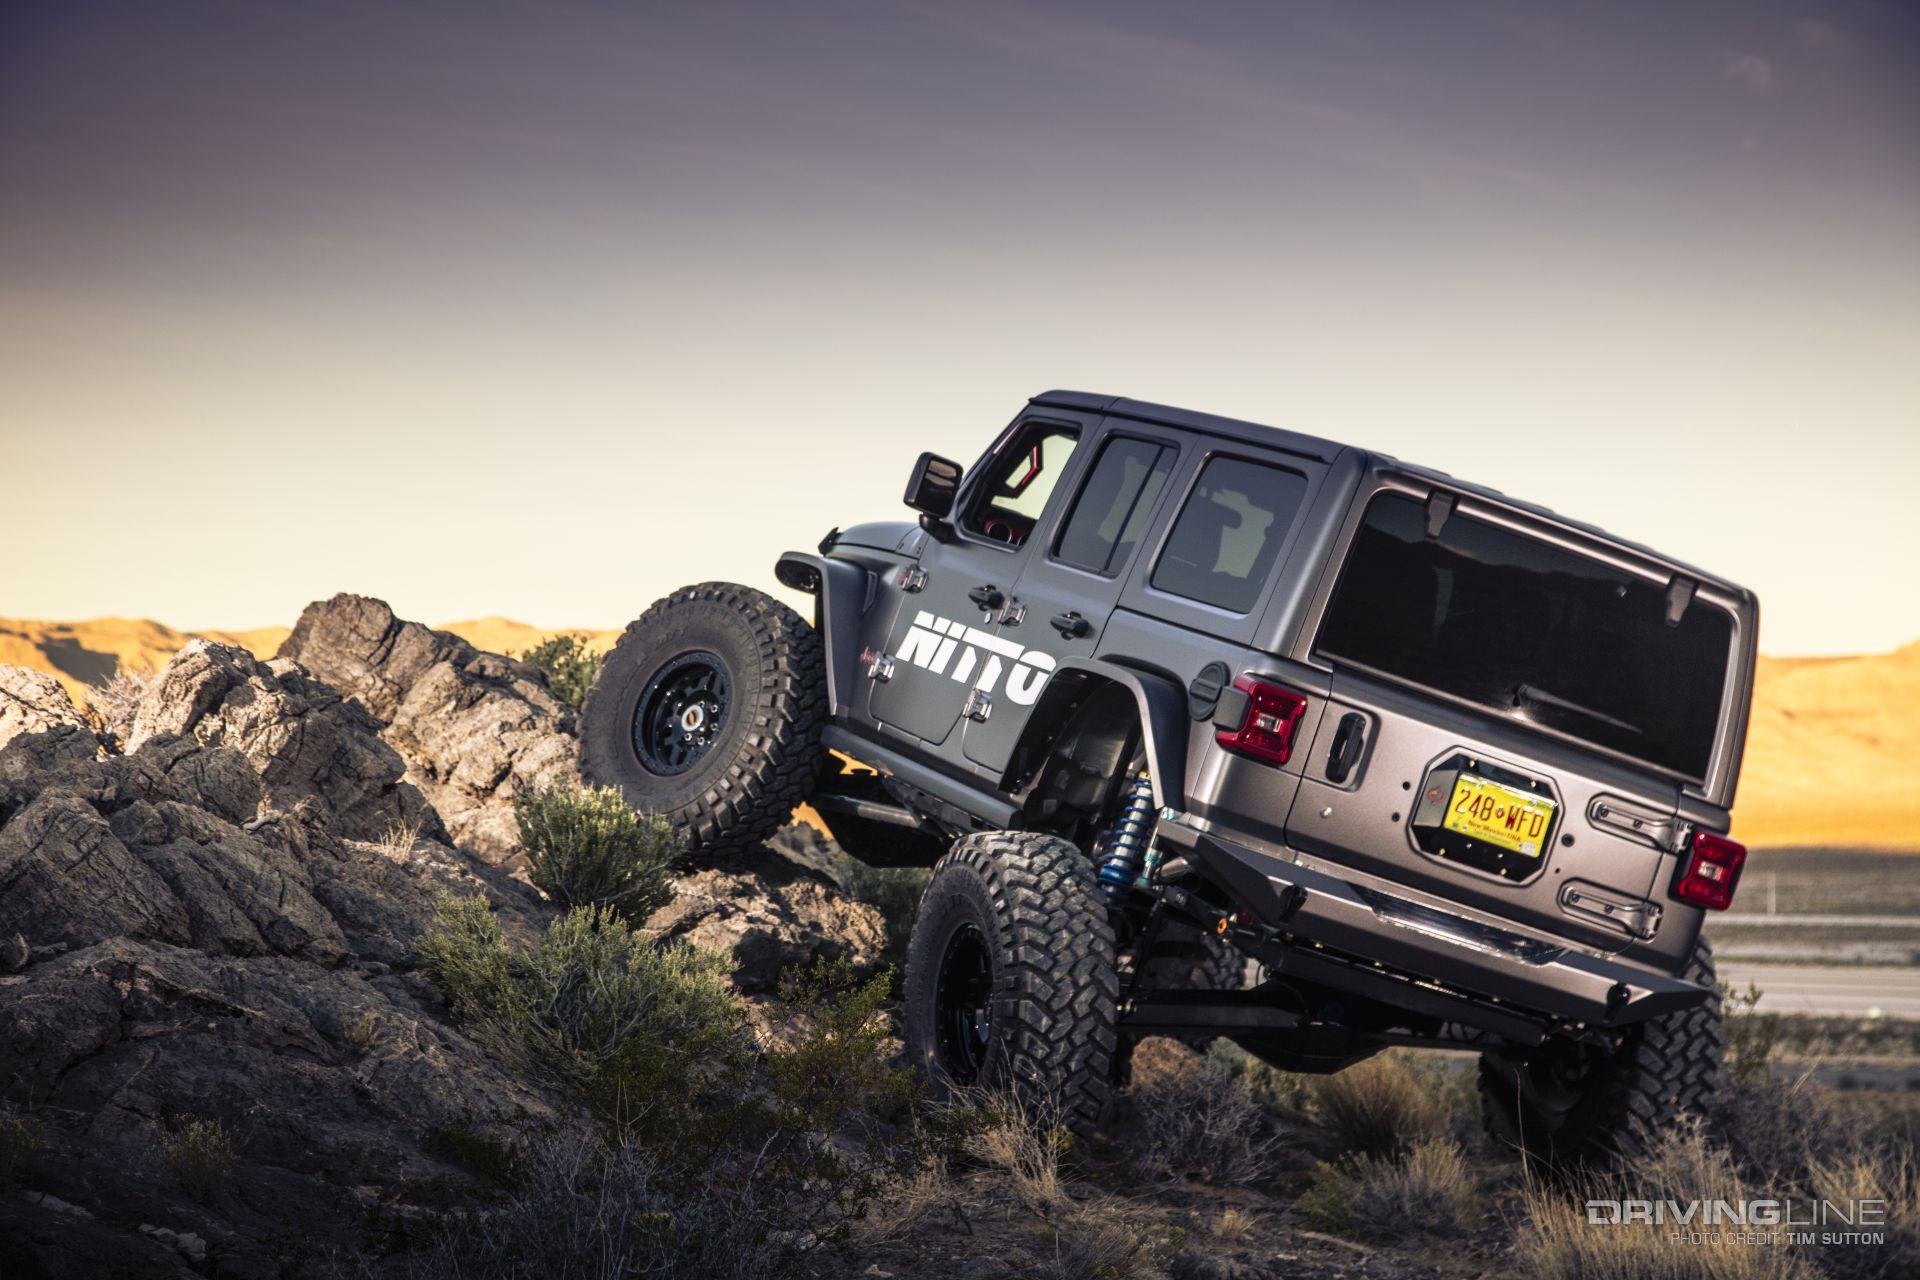 Loren Healy's Race Inspired Jeep JL [Video] | DrivingLine